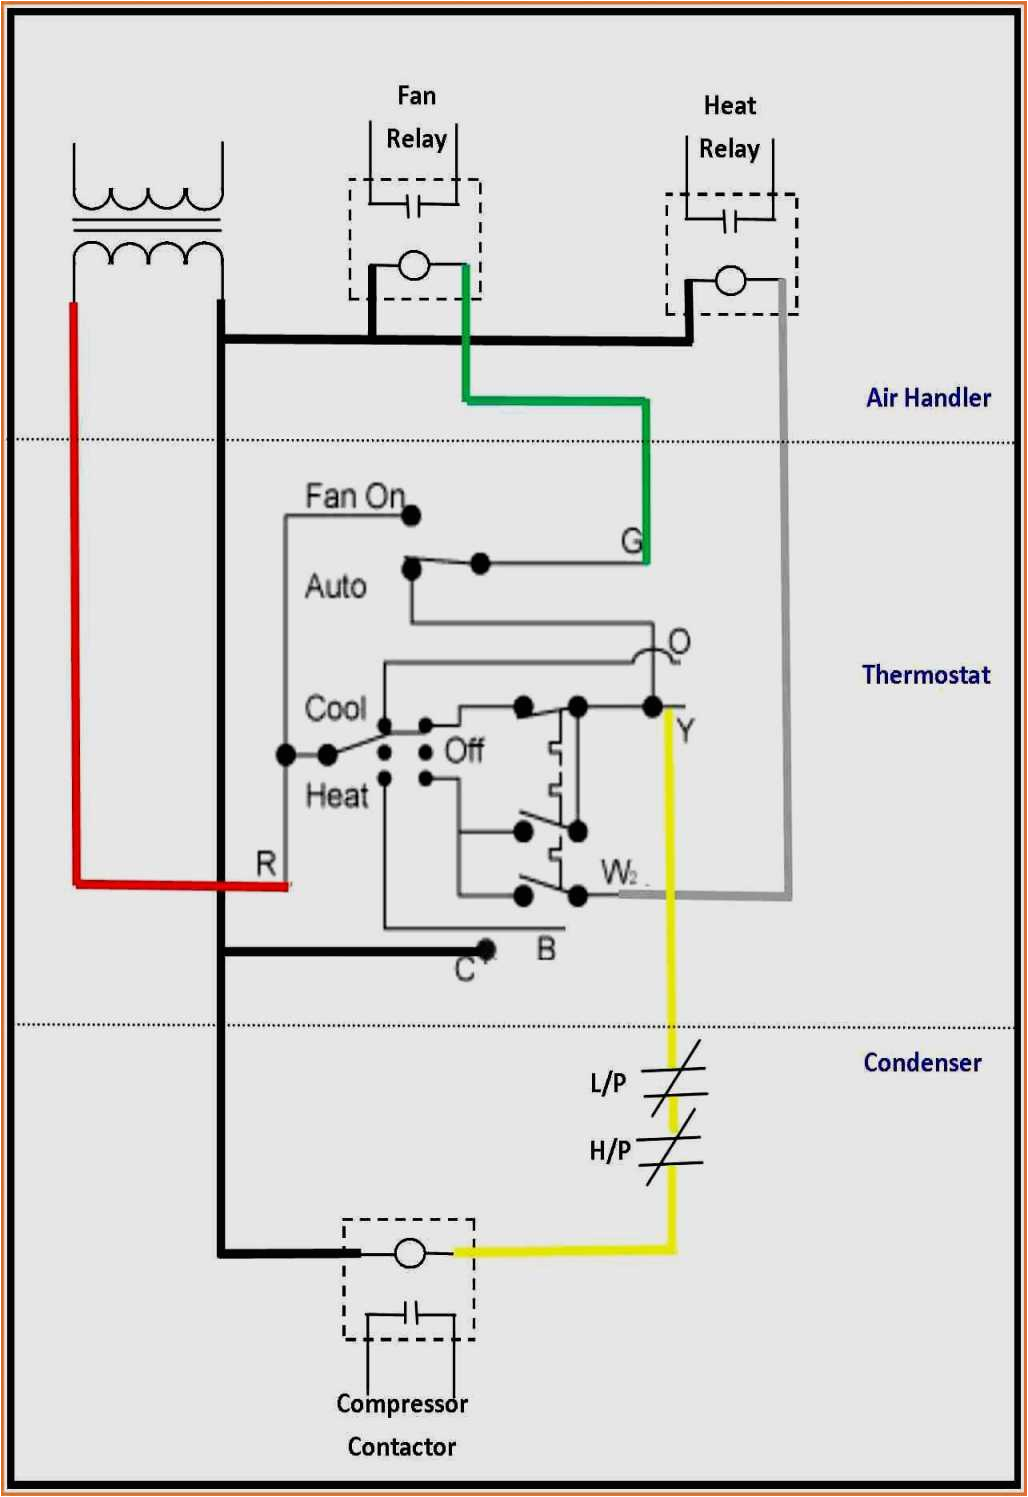 Thermostat Wiring Diagram Air Conditioner Wiring Diagram Sea Ray Boat Ac thermostat Wiring Diagram Data